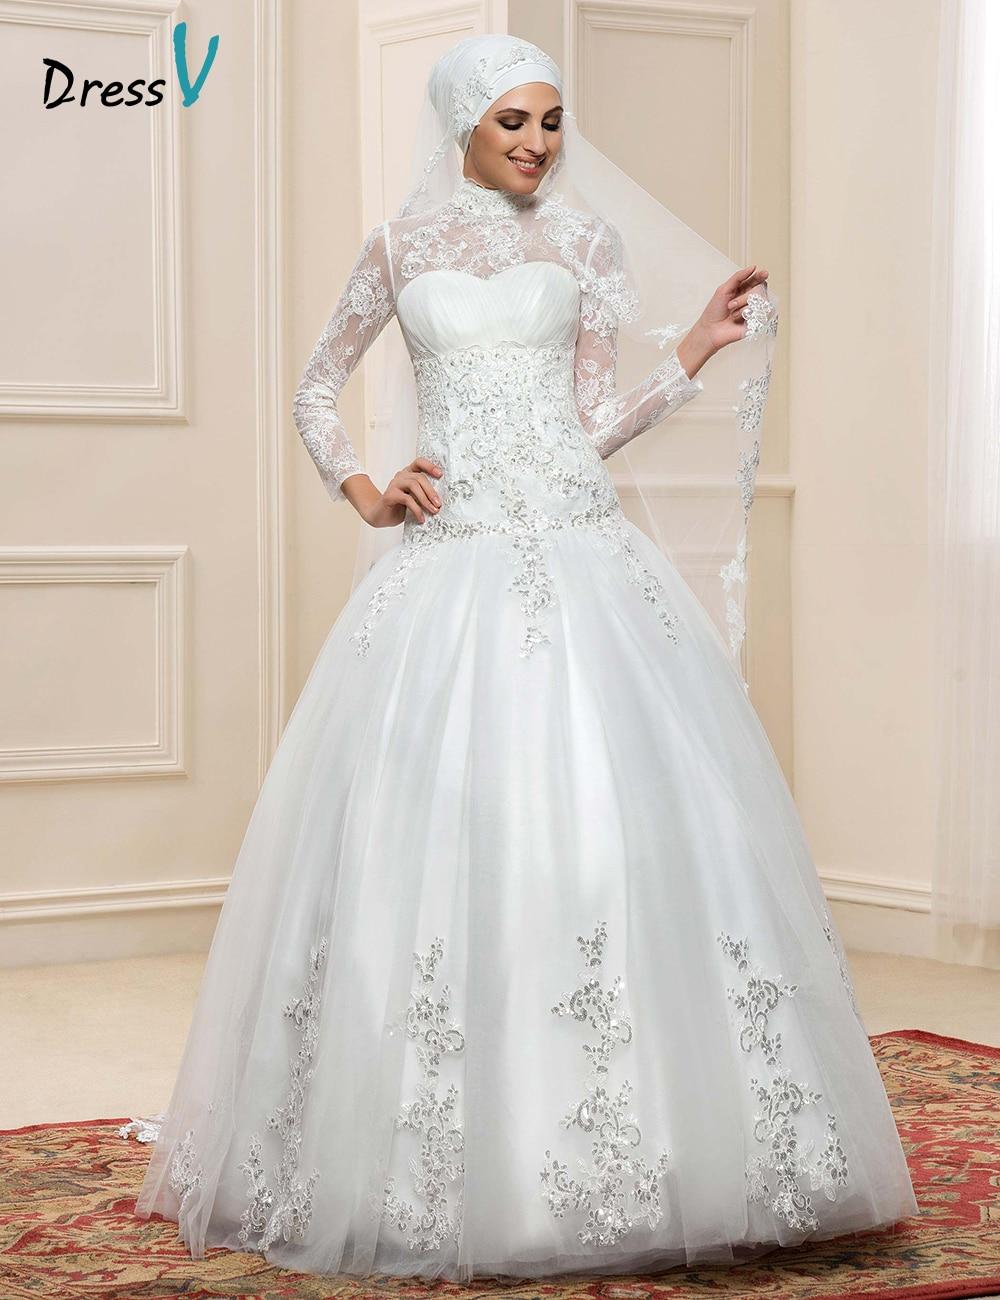 Popular Turtleneck Wedding Dress Buy Cheap Turtleneck Wedding Dress Lots From China Turtleneck